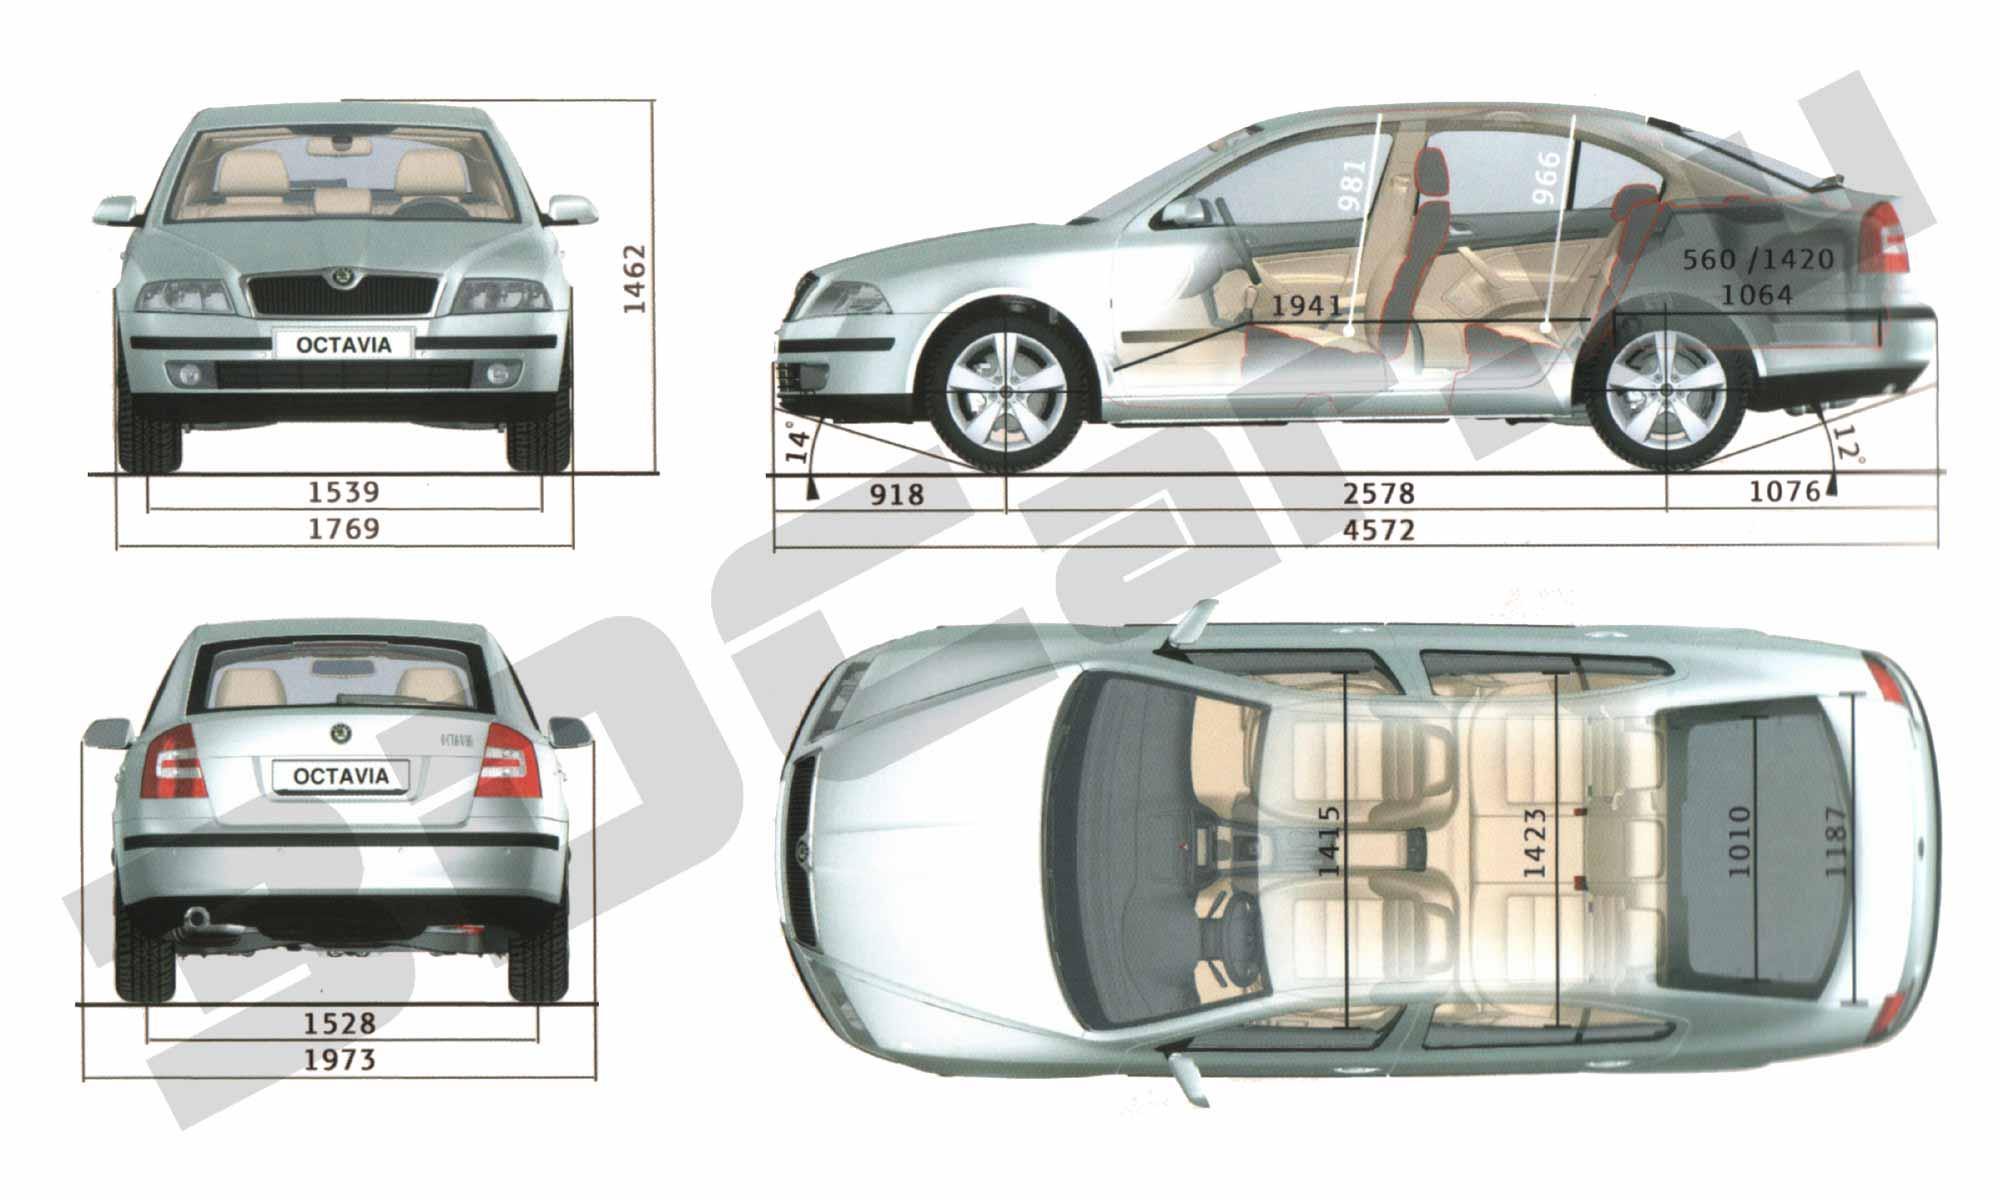 Http www 3dcar ru blueprints skoda skodaoctavia2007